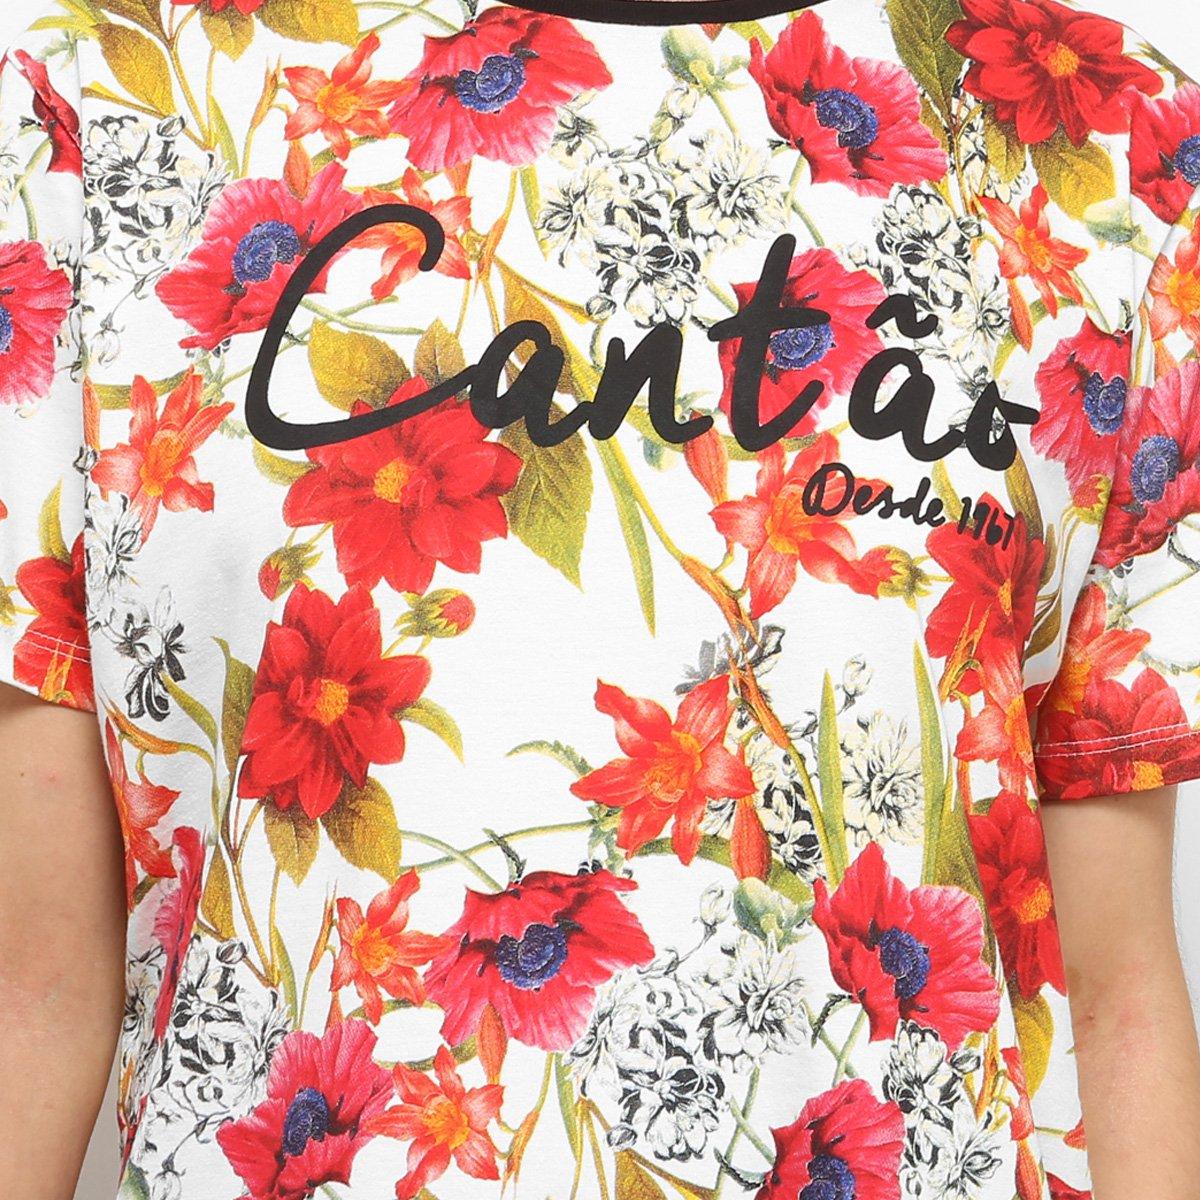 Feminina Cantão Estampa Floral Camiseta Camiseta Branco Estampa Cantão Floral Feminina q8ZwpxTAB